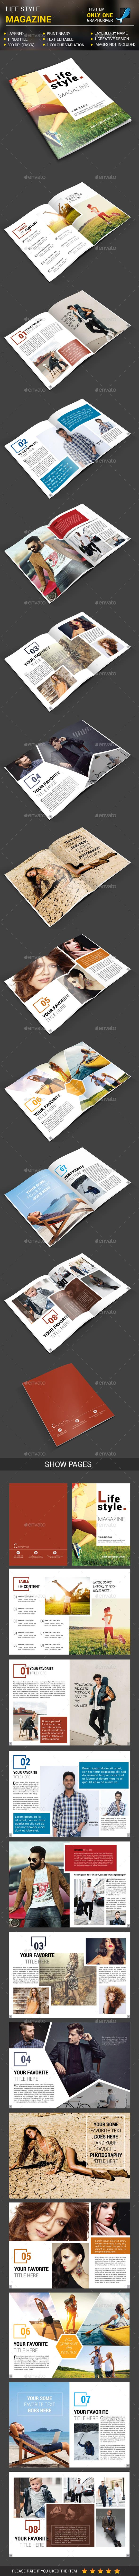 GraphicRiver Lifestyle Magazine 21103981